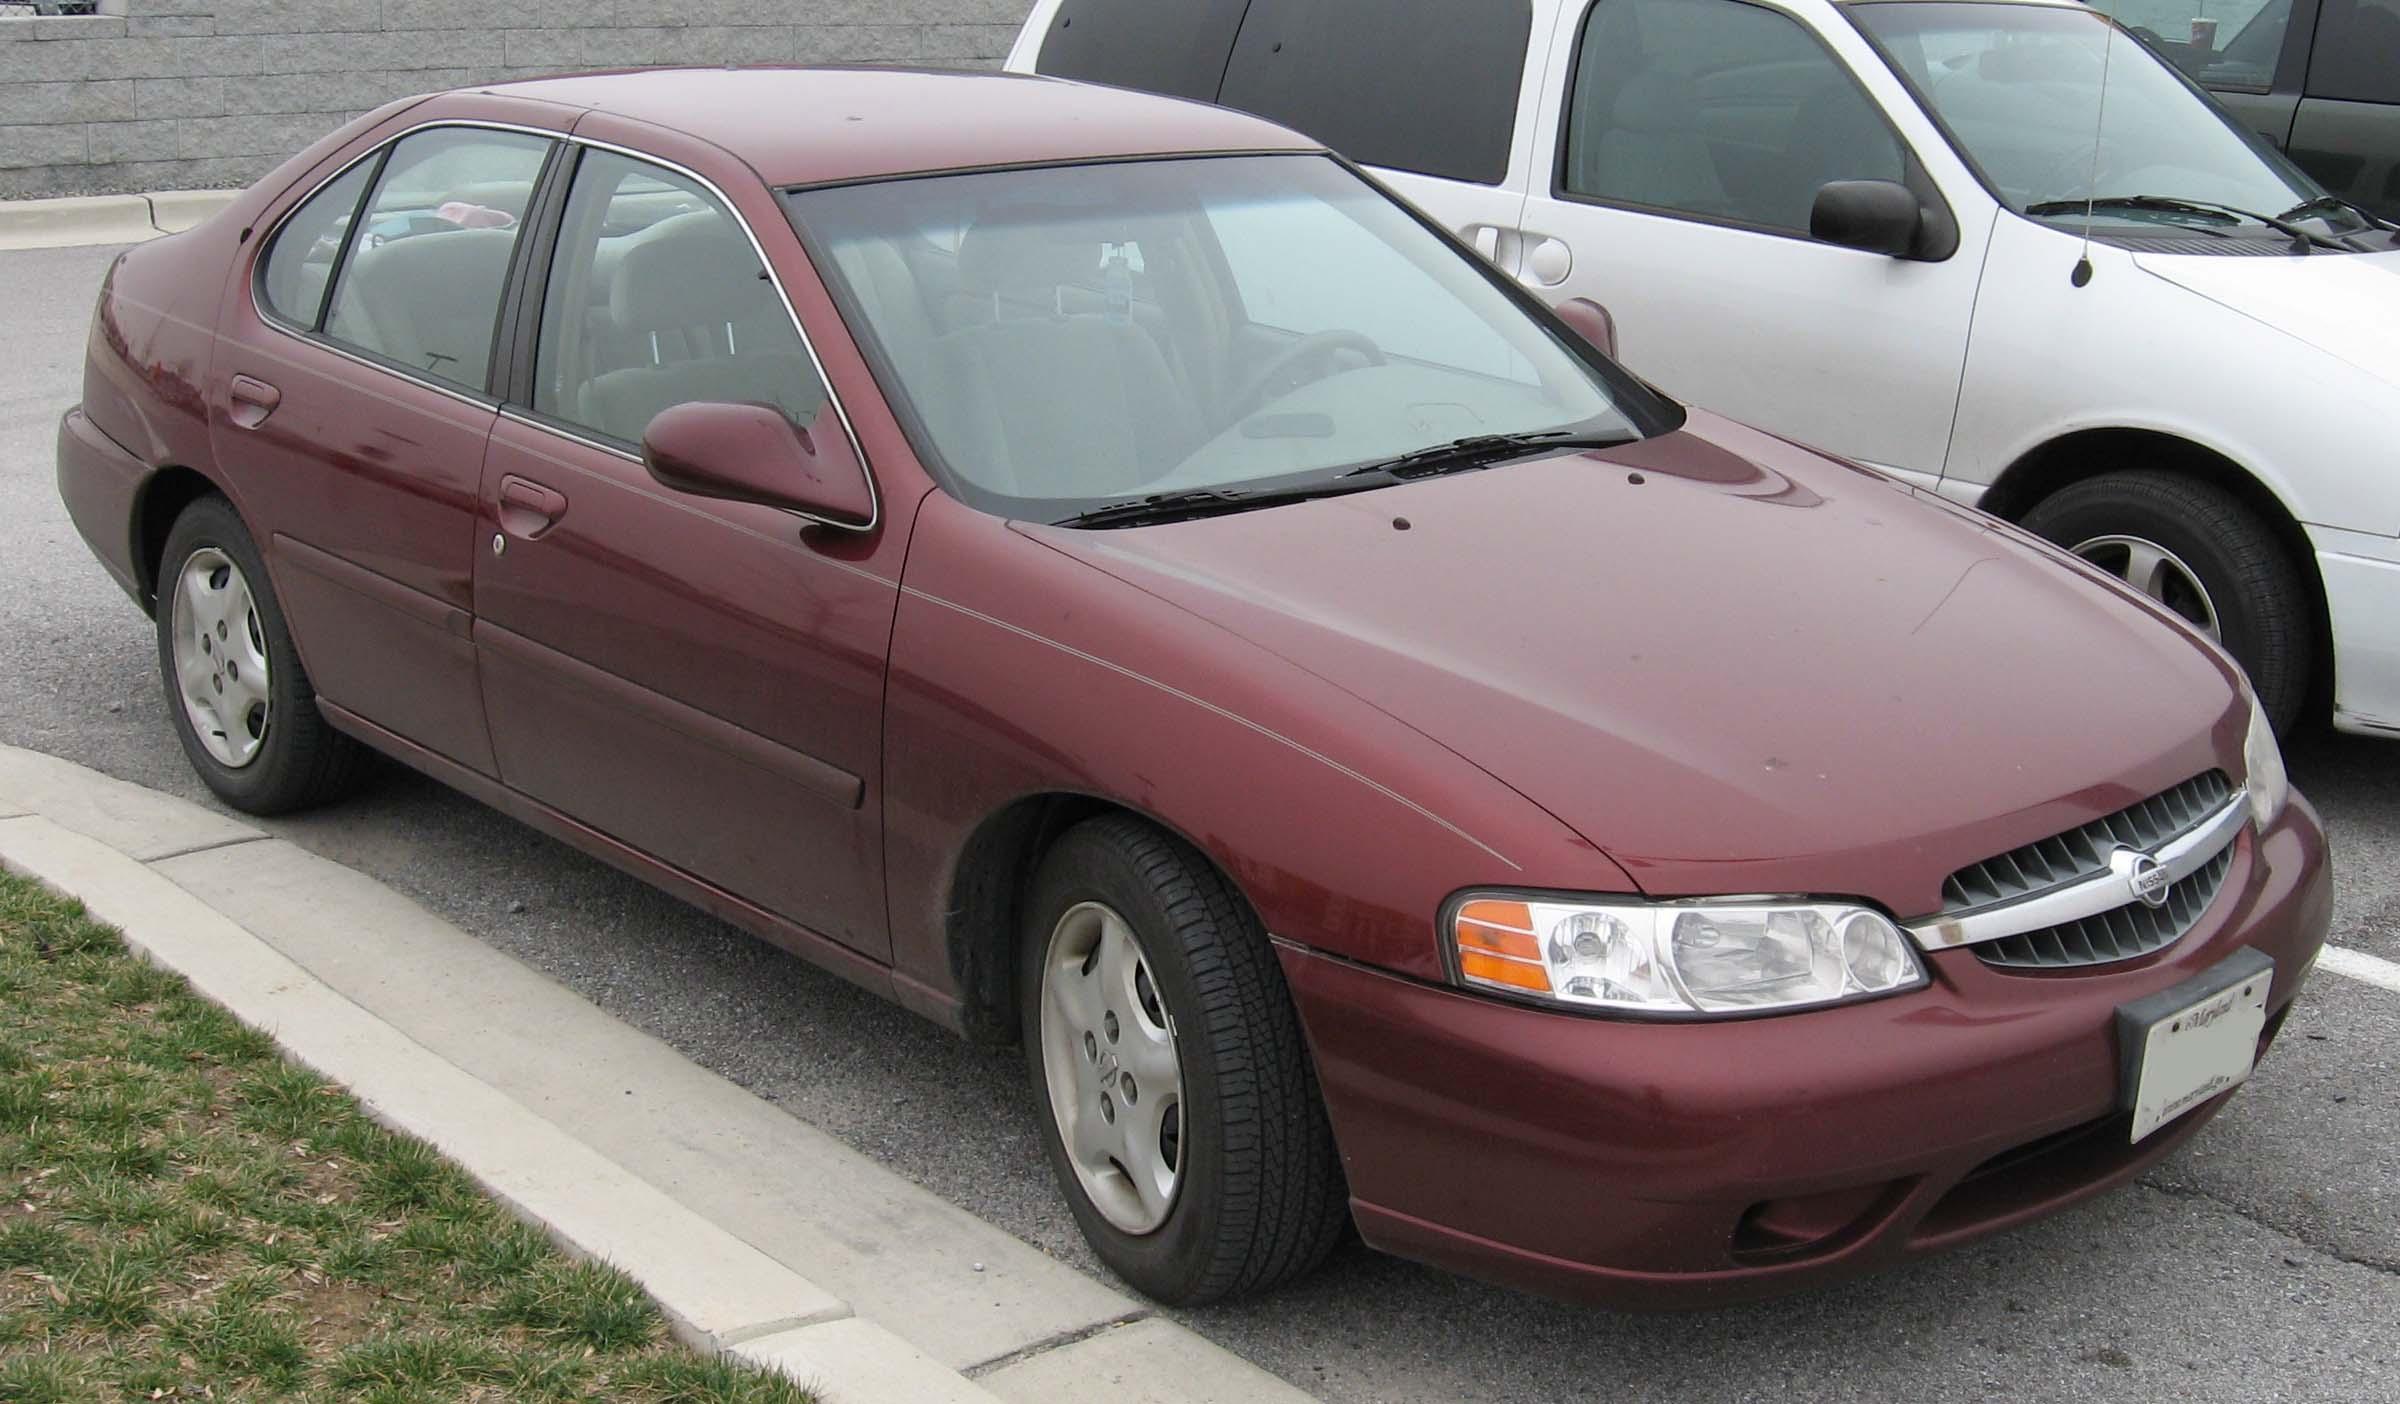 File:2000-2001 Nissan Altima.jpg - Wikimedia Commons